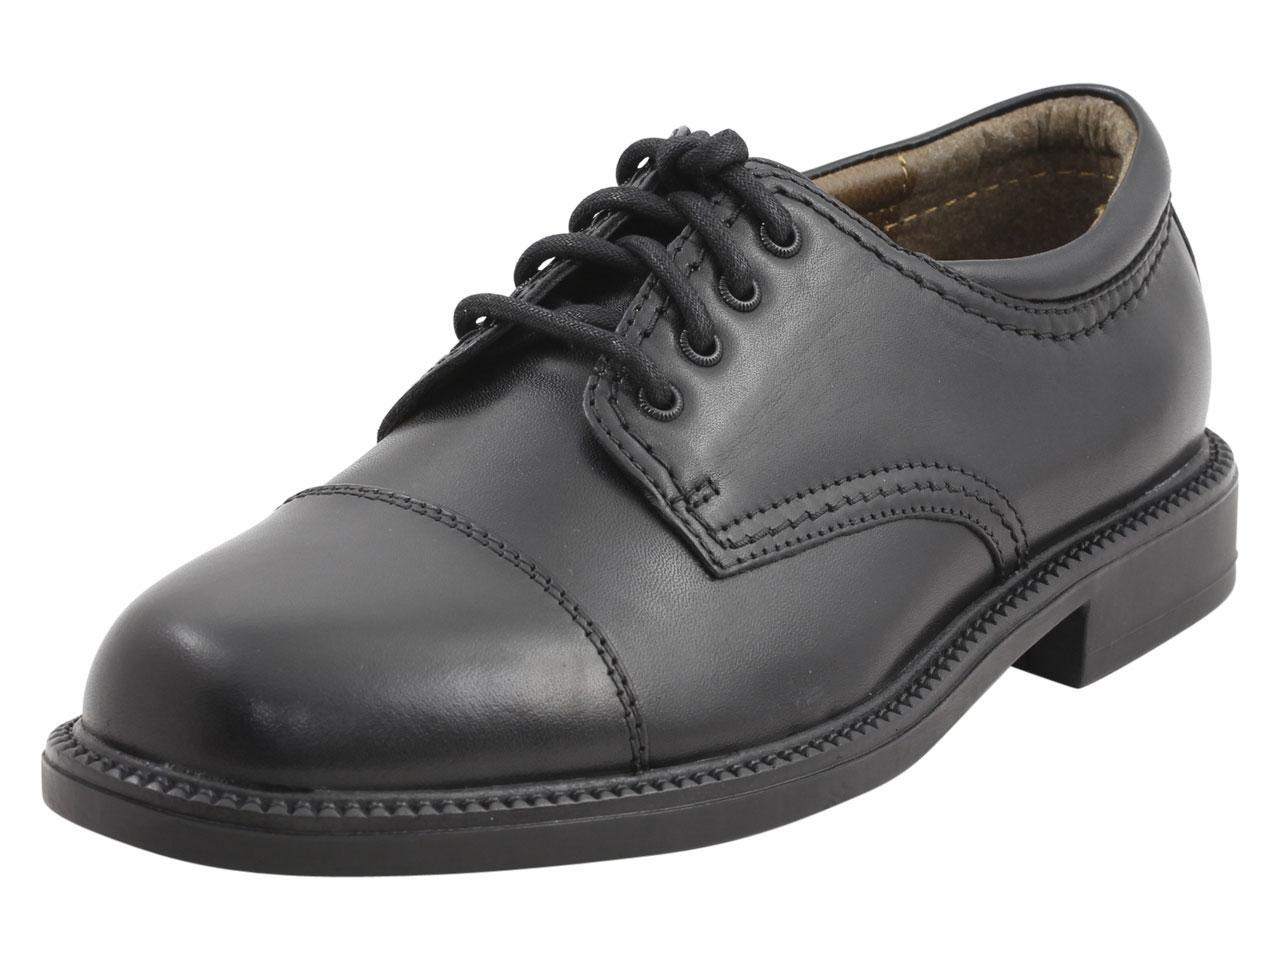 Image of Dockers Men's Gordon Cap Toe Oxfords Shoes - Black - 9 E(W) US